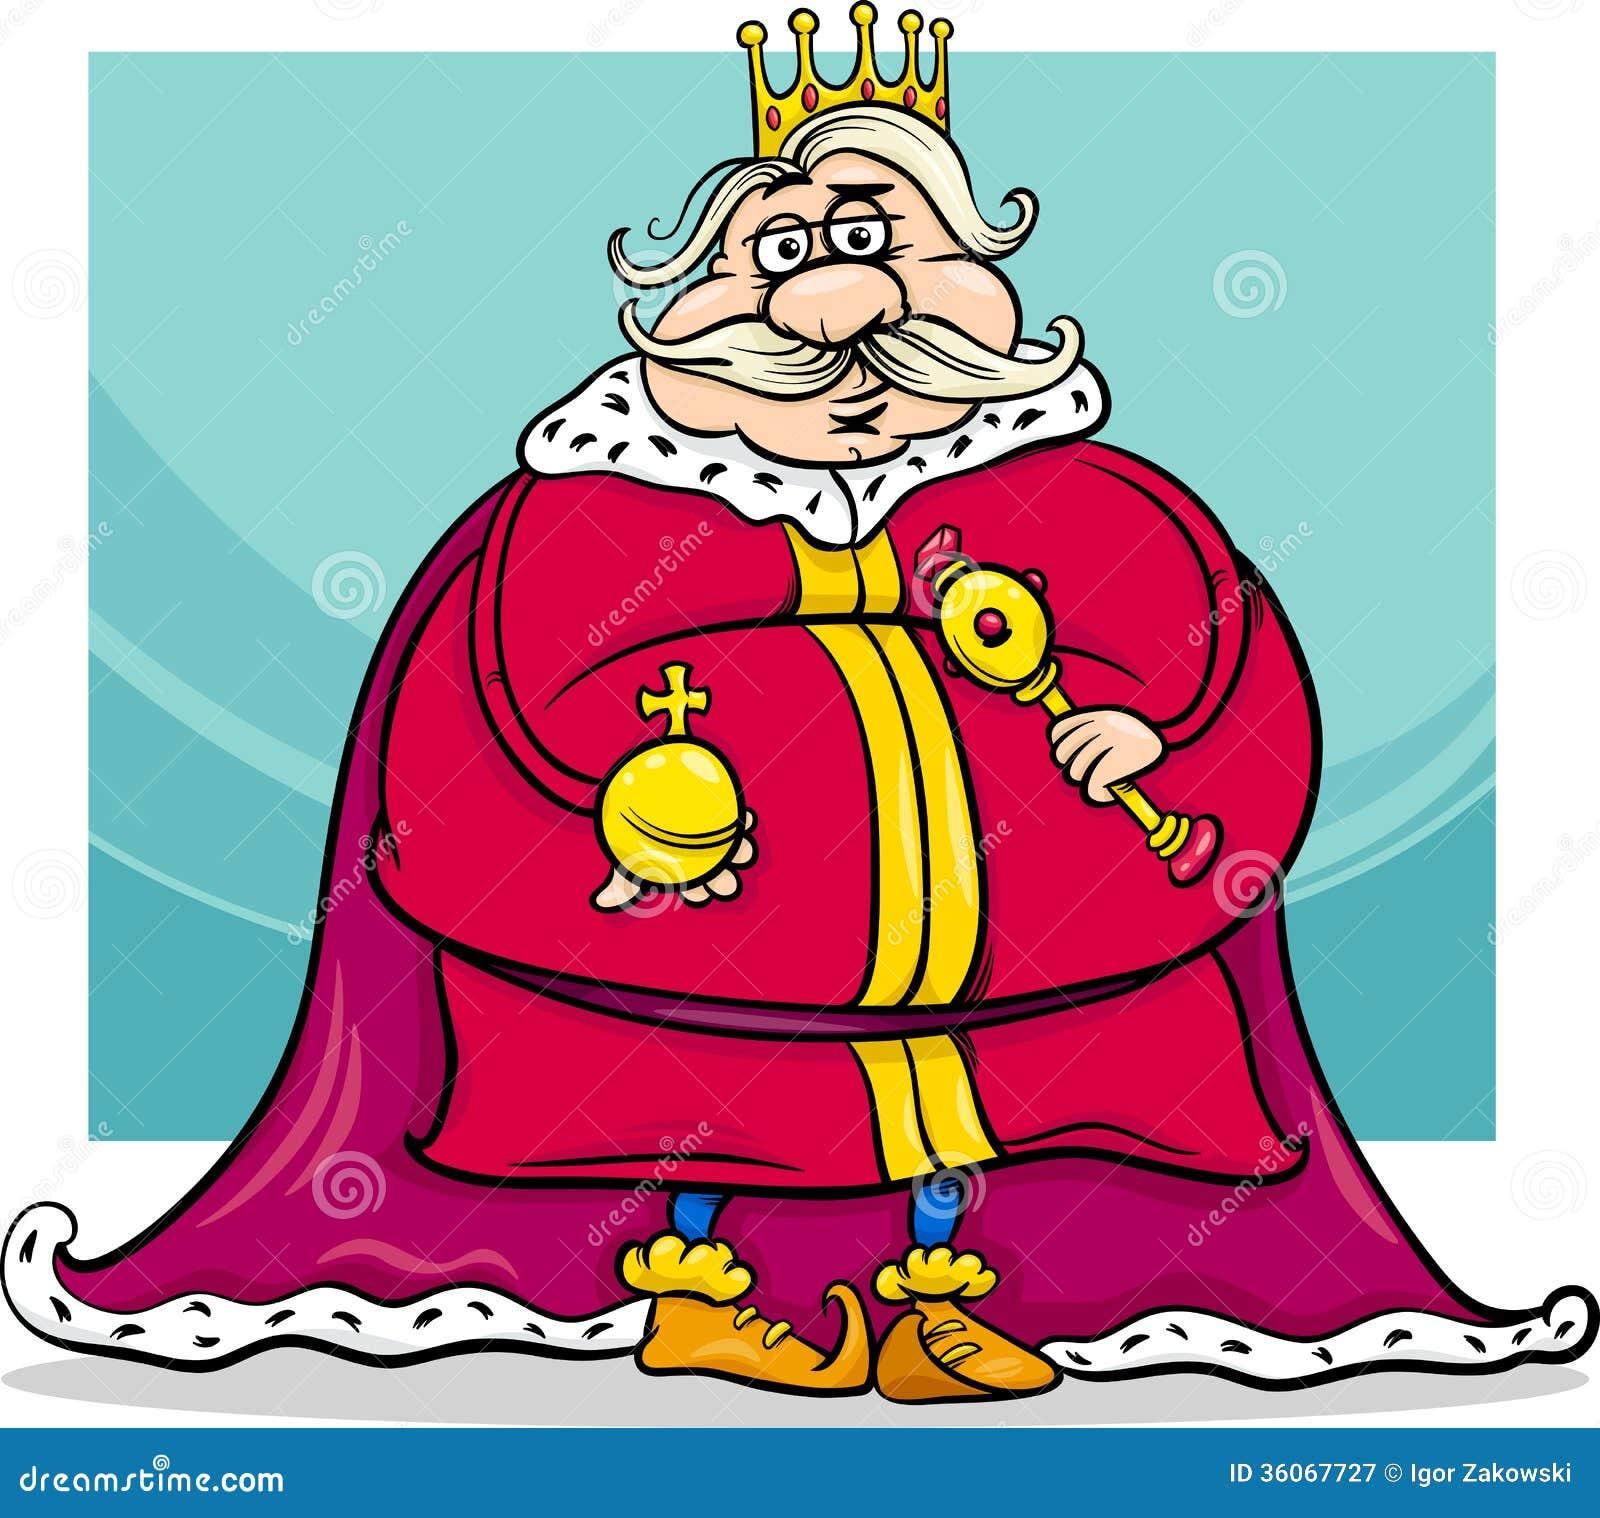 Fat King Cartoon Fantasy Character Royalty Free Stock Photography ... Royal Blue Throne